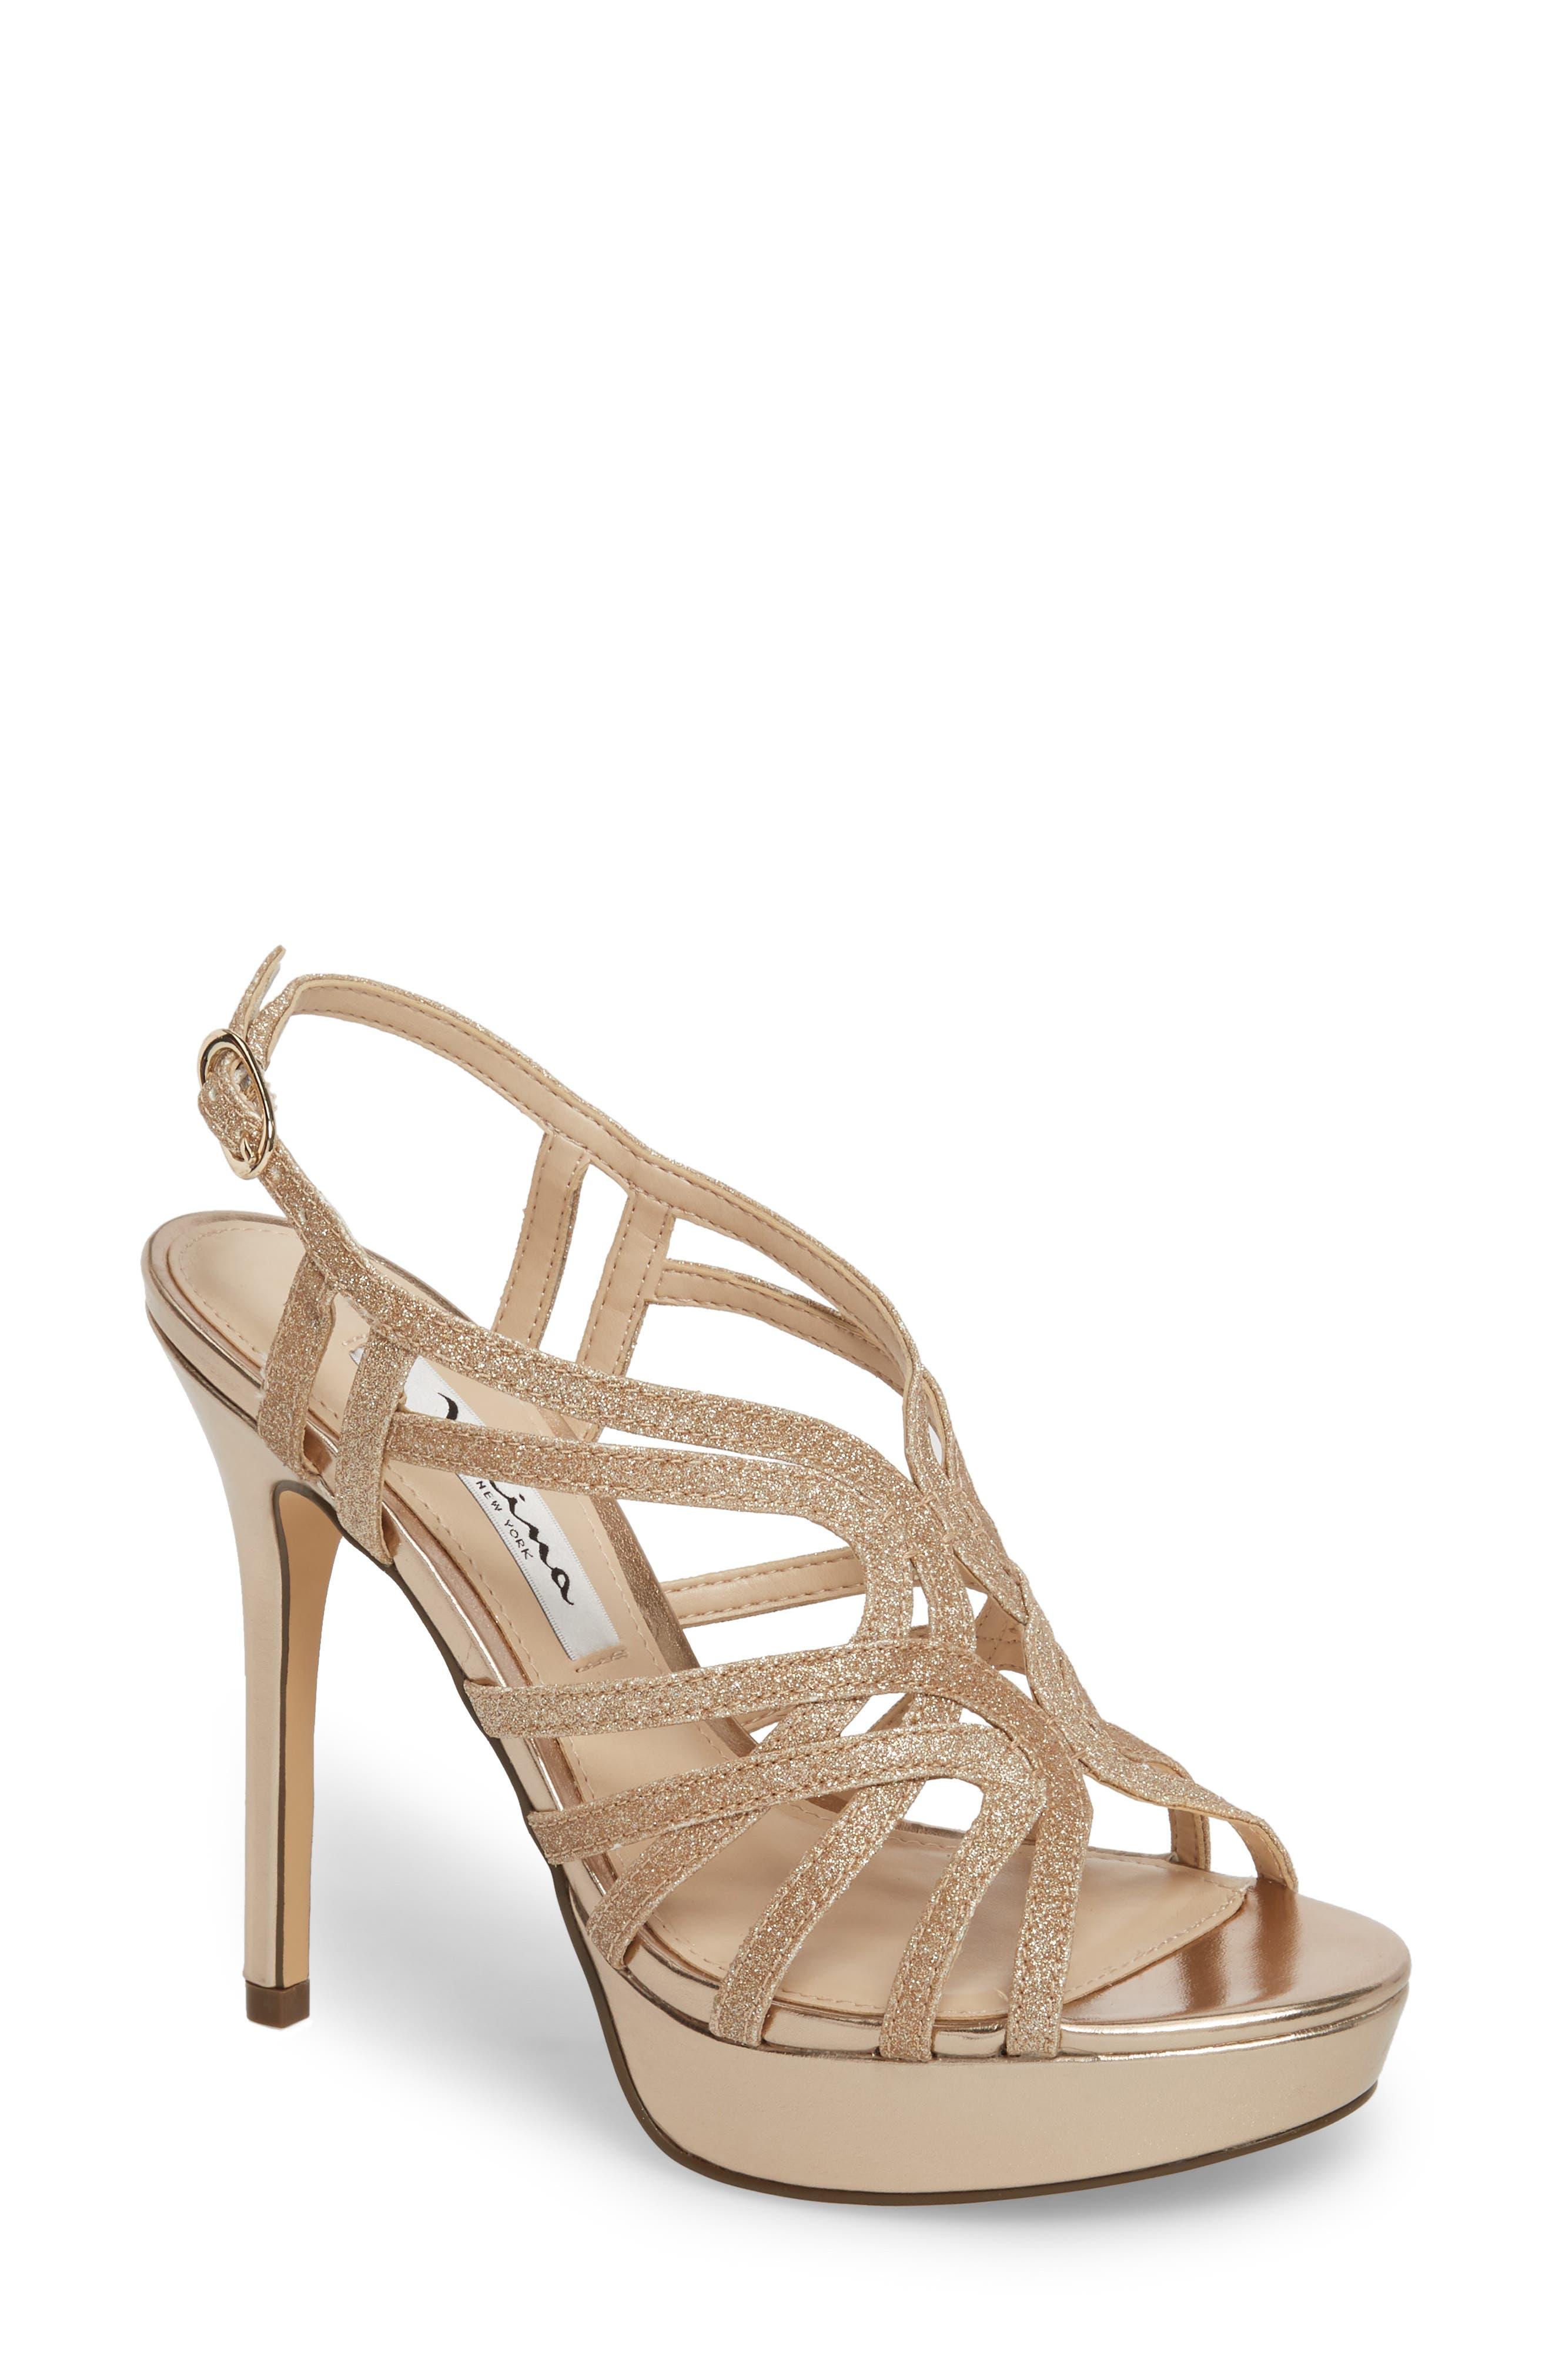 Solina Platform Sandal,                             Main thumbnail 1, color,                             Gold Glitter Fabric